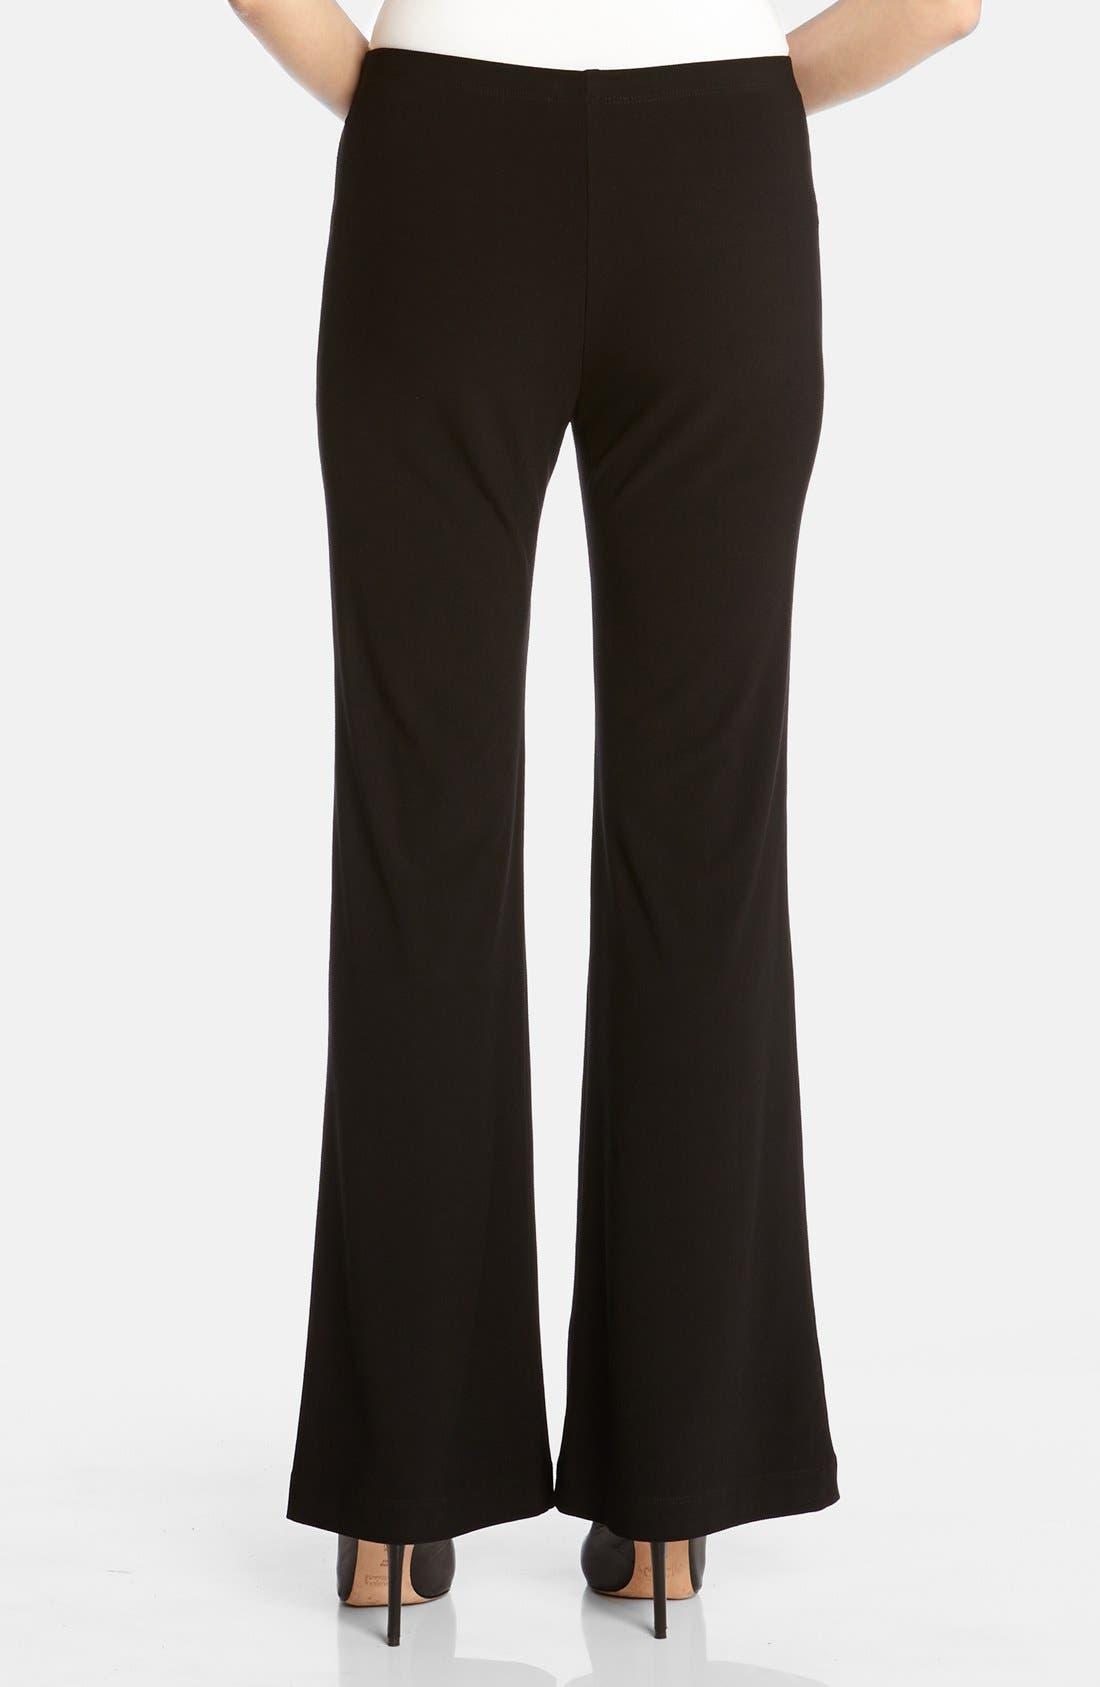 KAREN KANE, Wide Leg Crepe Pants, Alternate thumbnail 4, color, BLACK